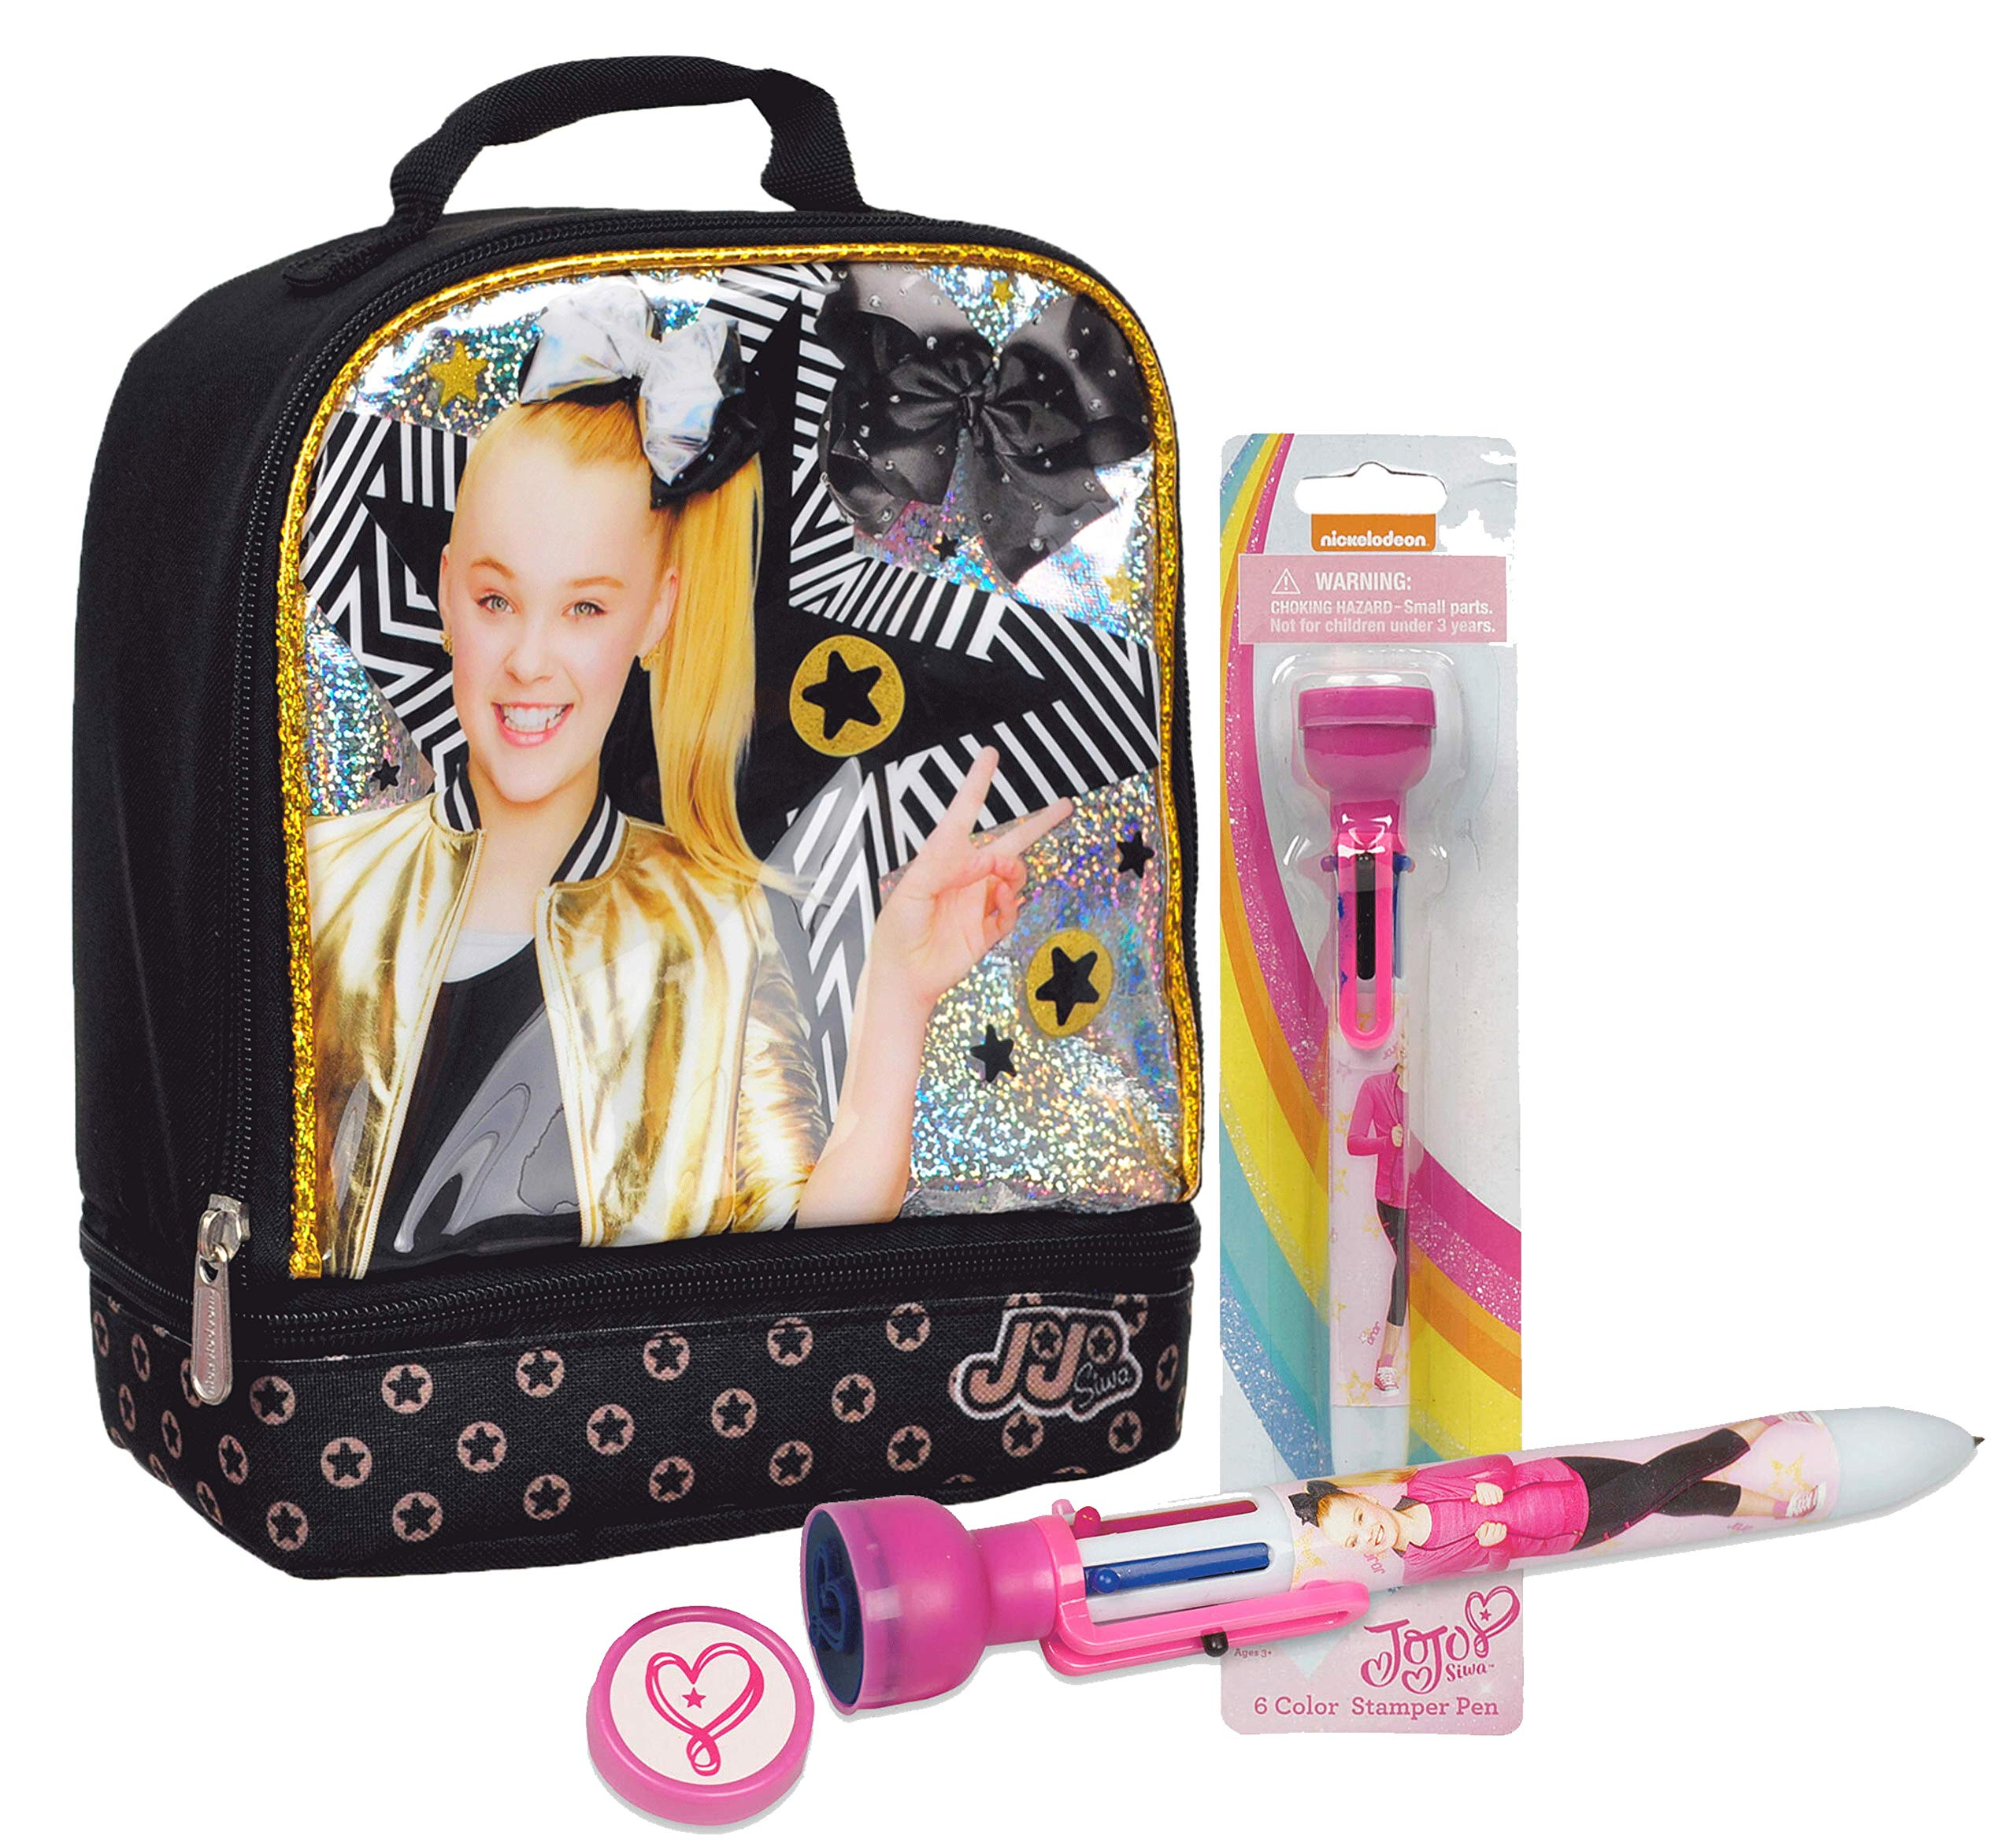 Jojo Siwa Dual Compartment Insulated Lunch Box! Plus JoJo Siwa 6 Color Stamper Pen! by Ruz